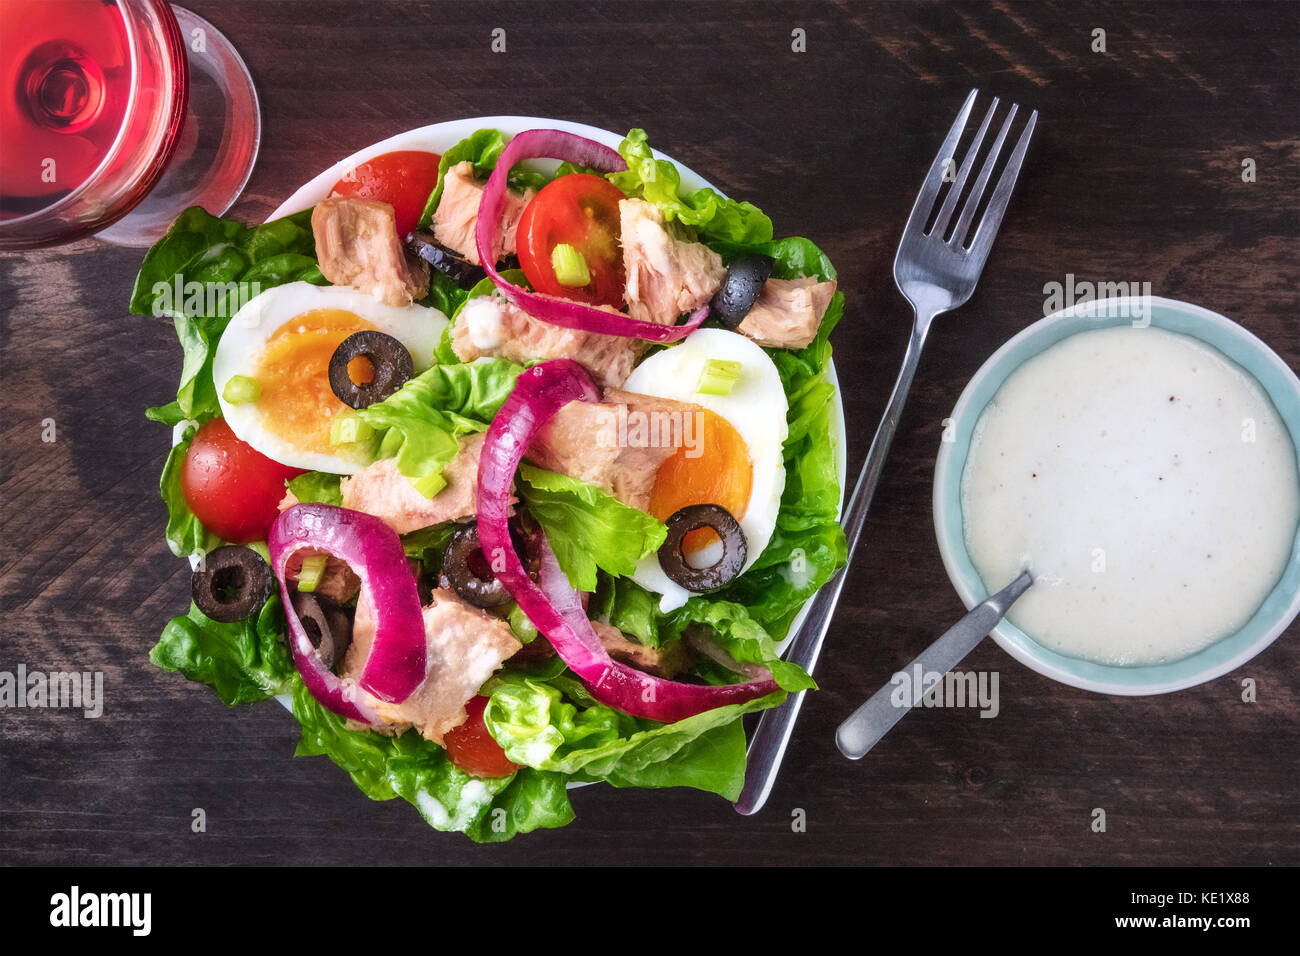 Overhead photo of tuna salad with rose wine, fork, sauce - Stock Image